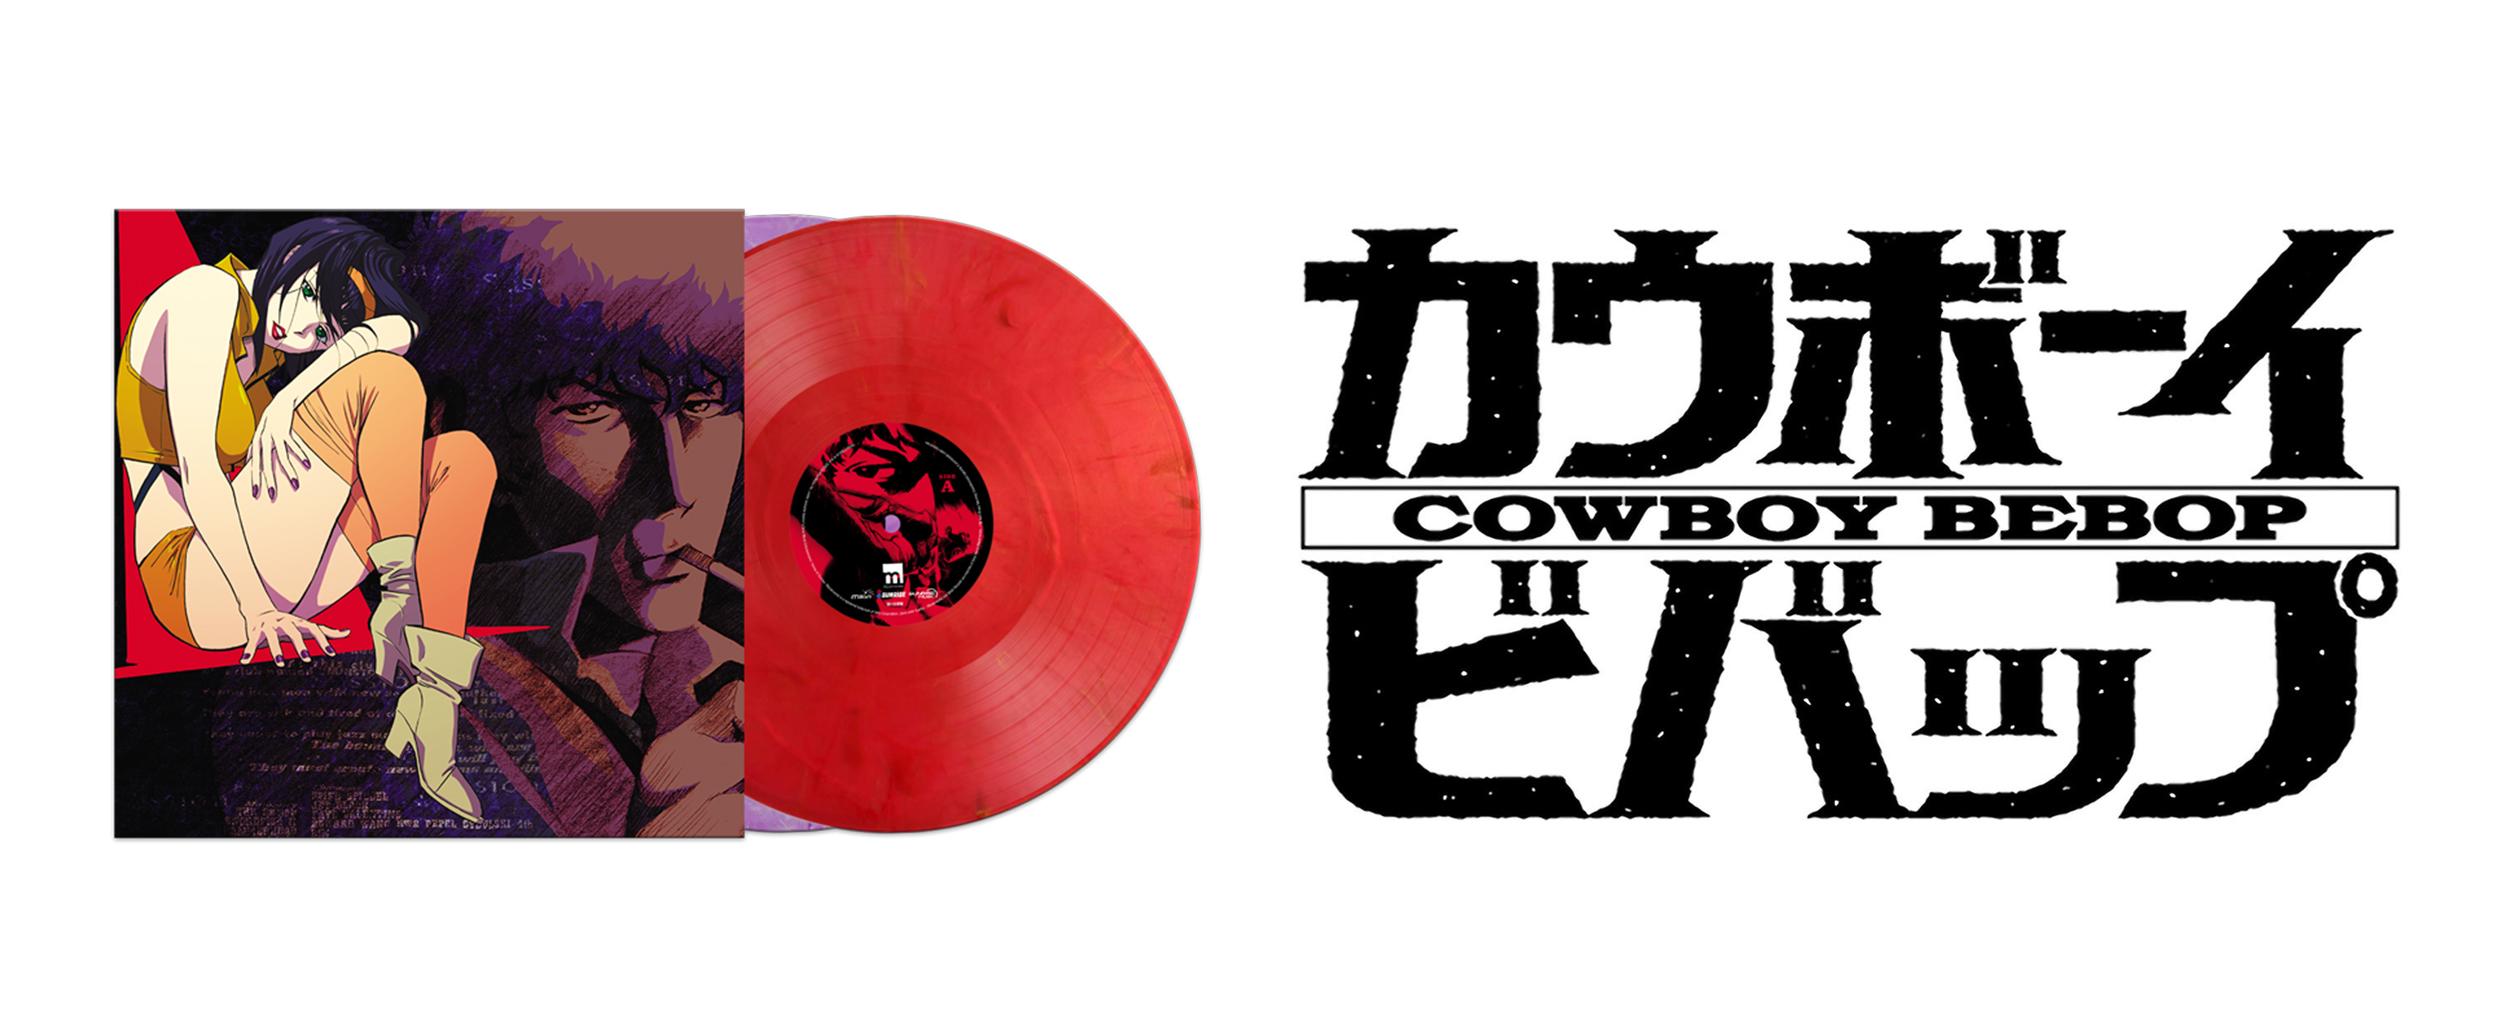 Cowboy Bebop - vinyl pre-order banner